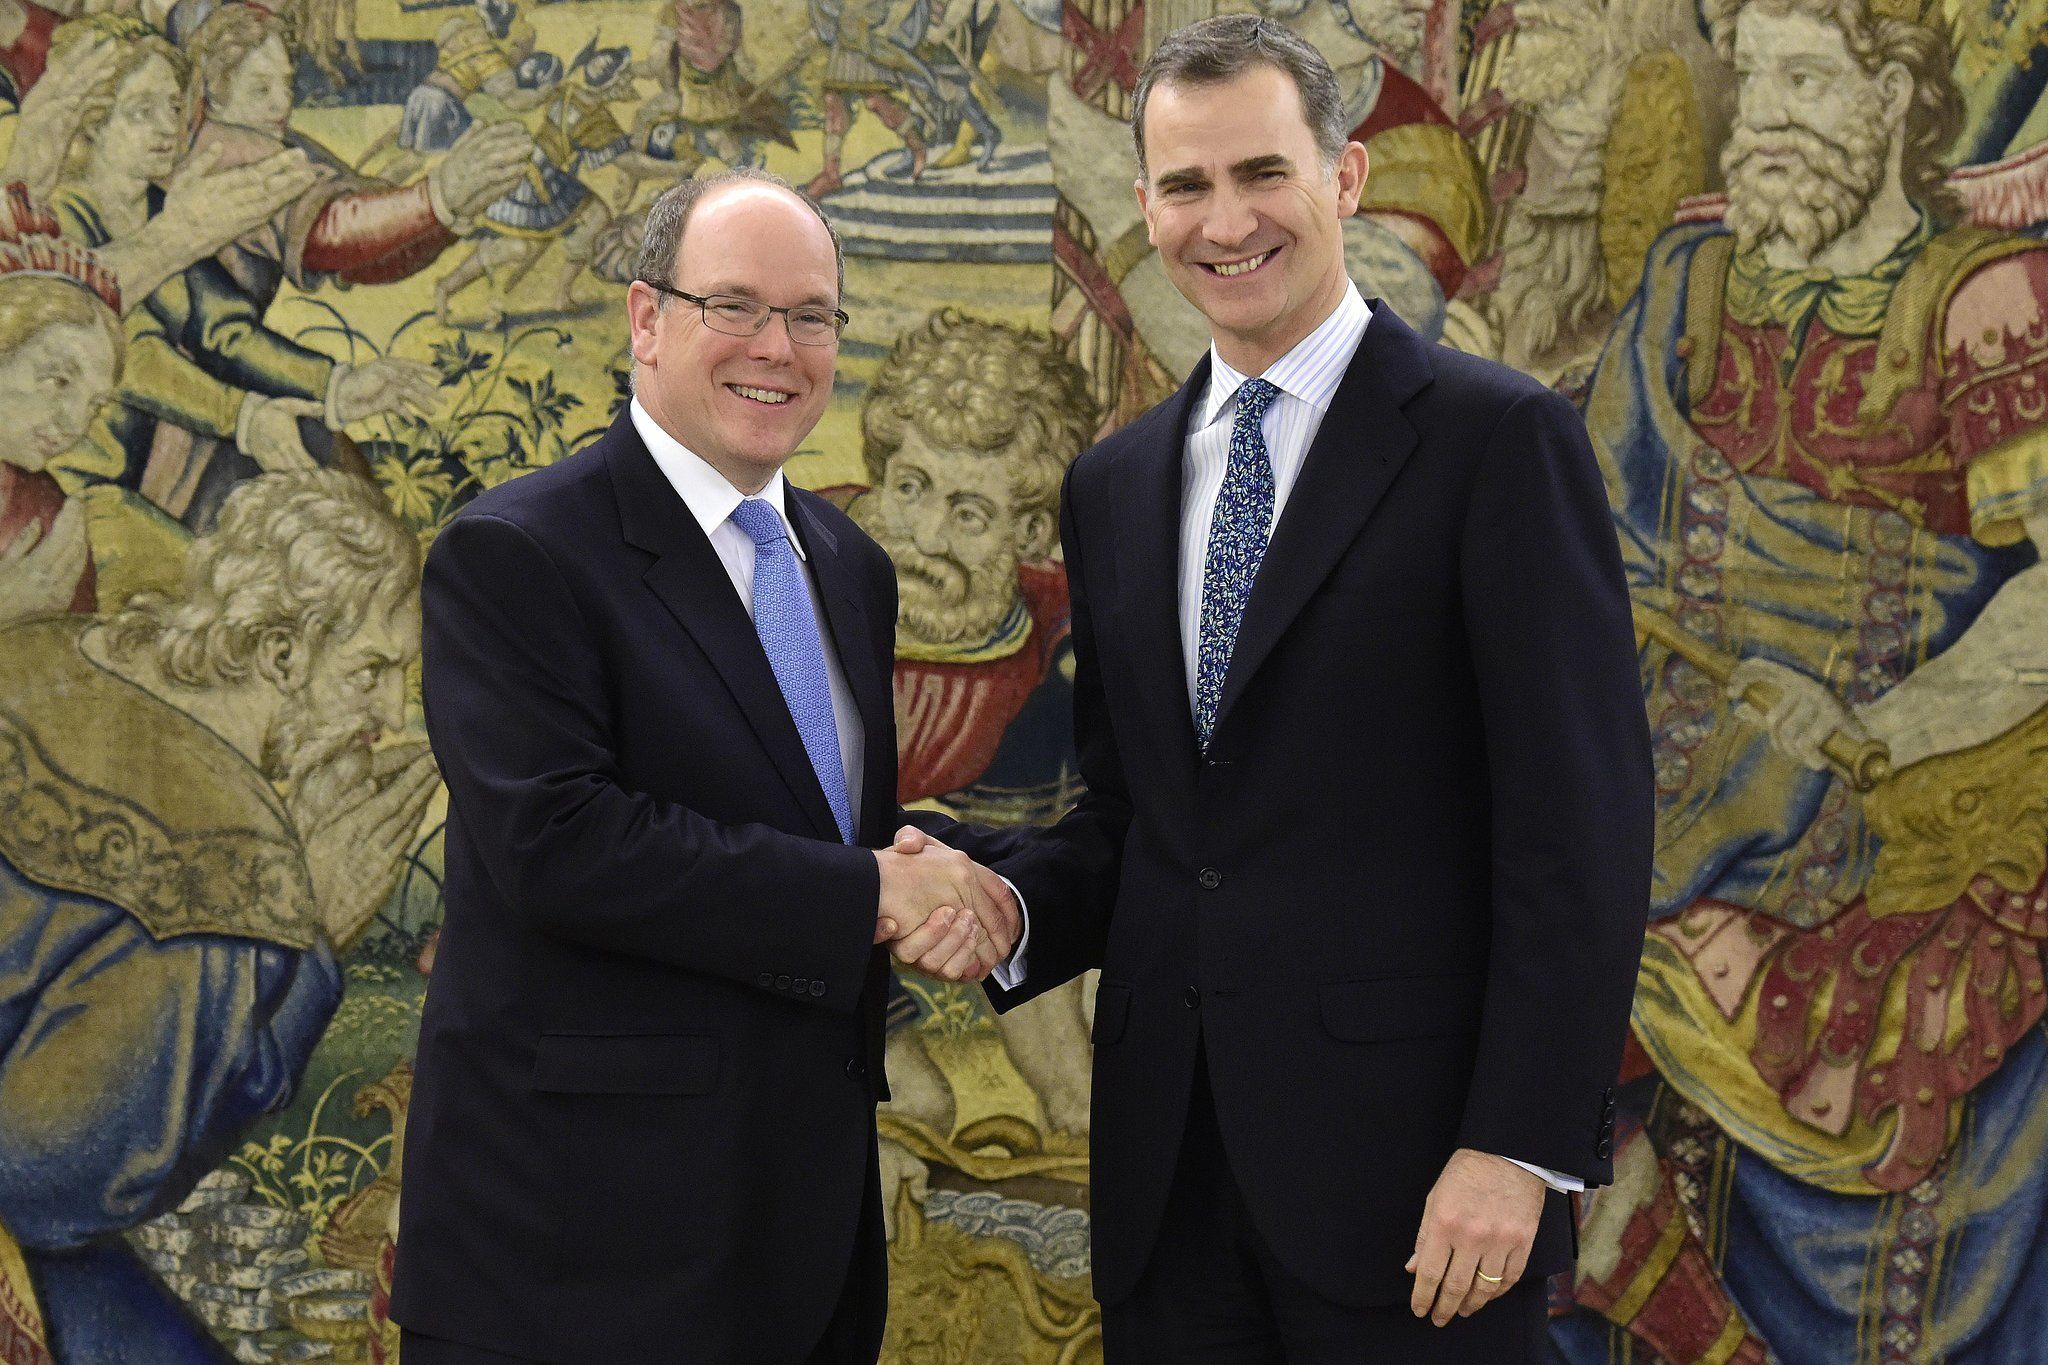 King Felipe VI meets with Monaco's Prince Albert II.